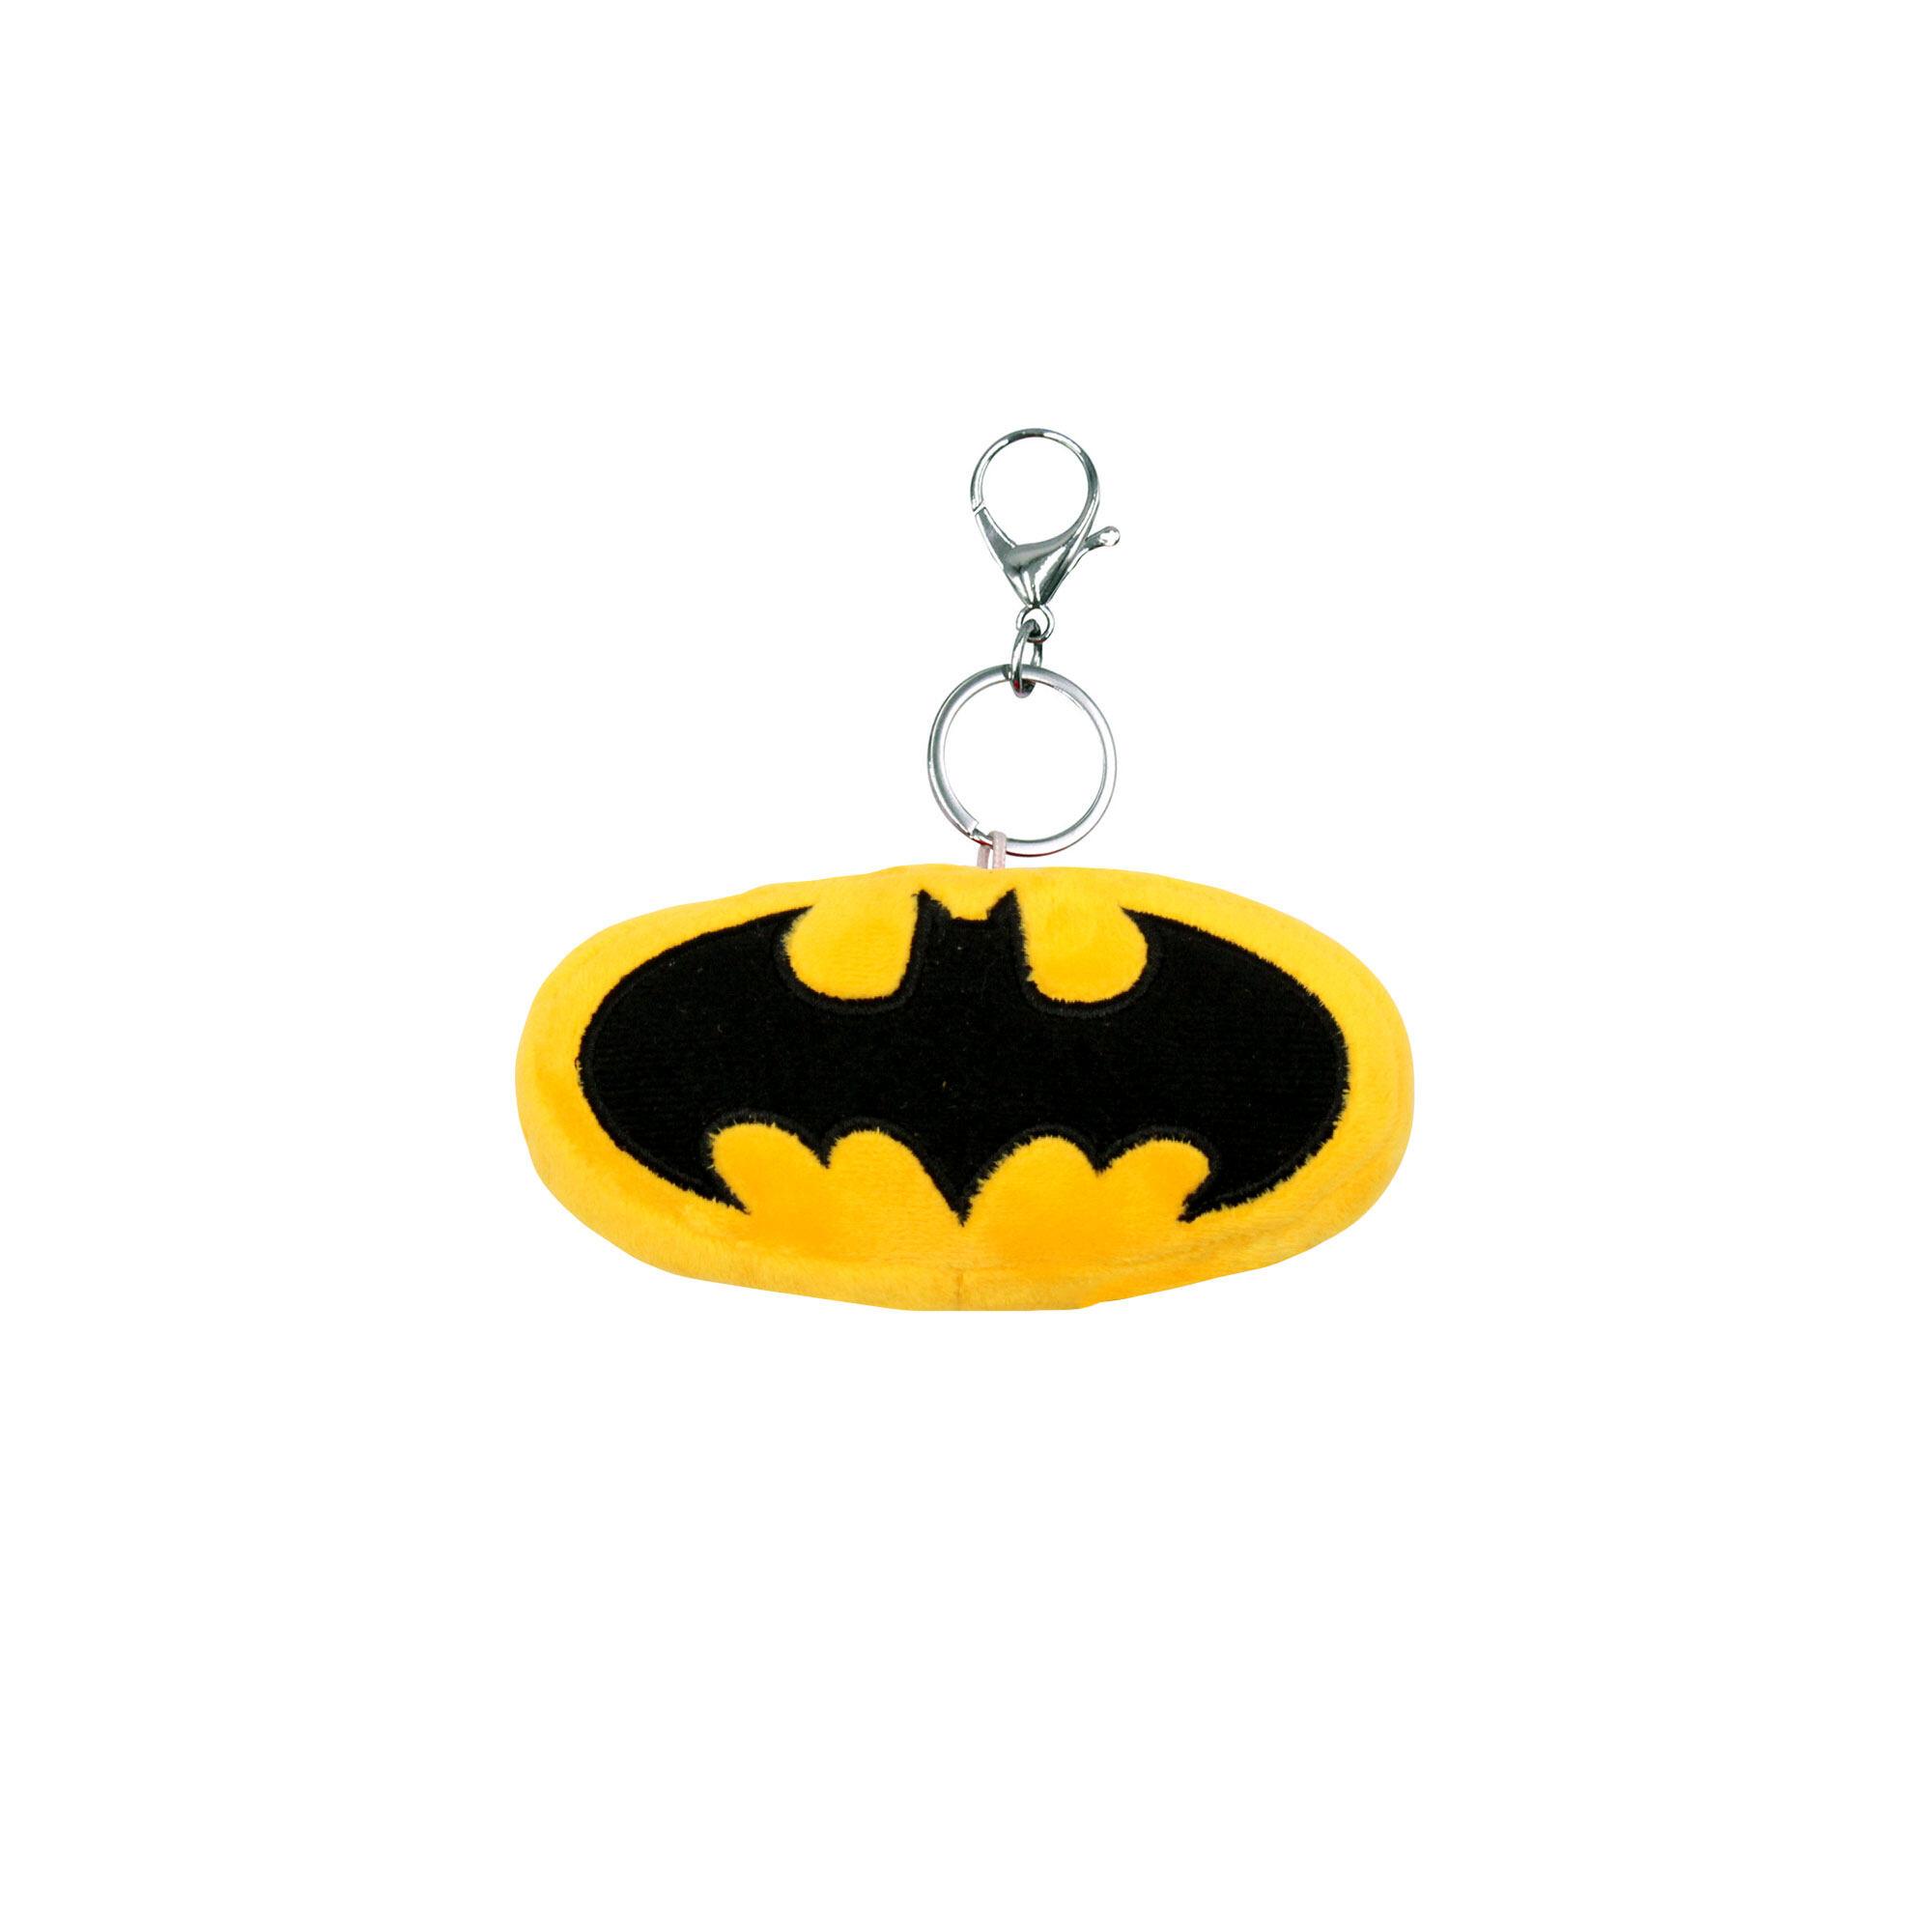 Dc Comics Justice League Batman Logo Plush Toy Key Ring - Yellow